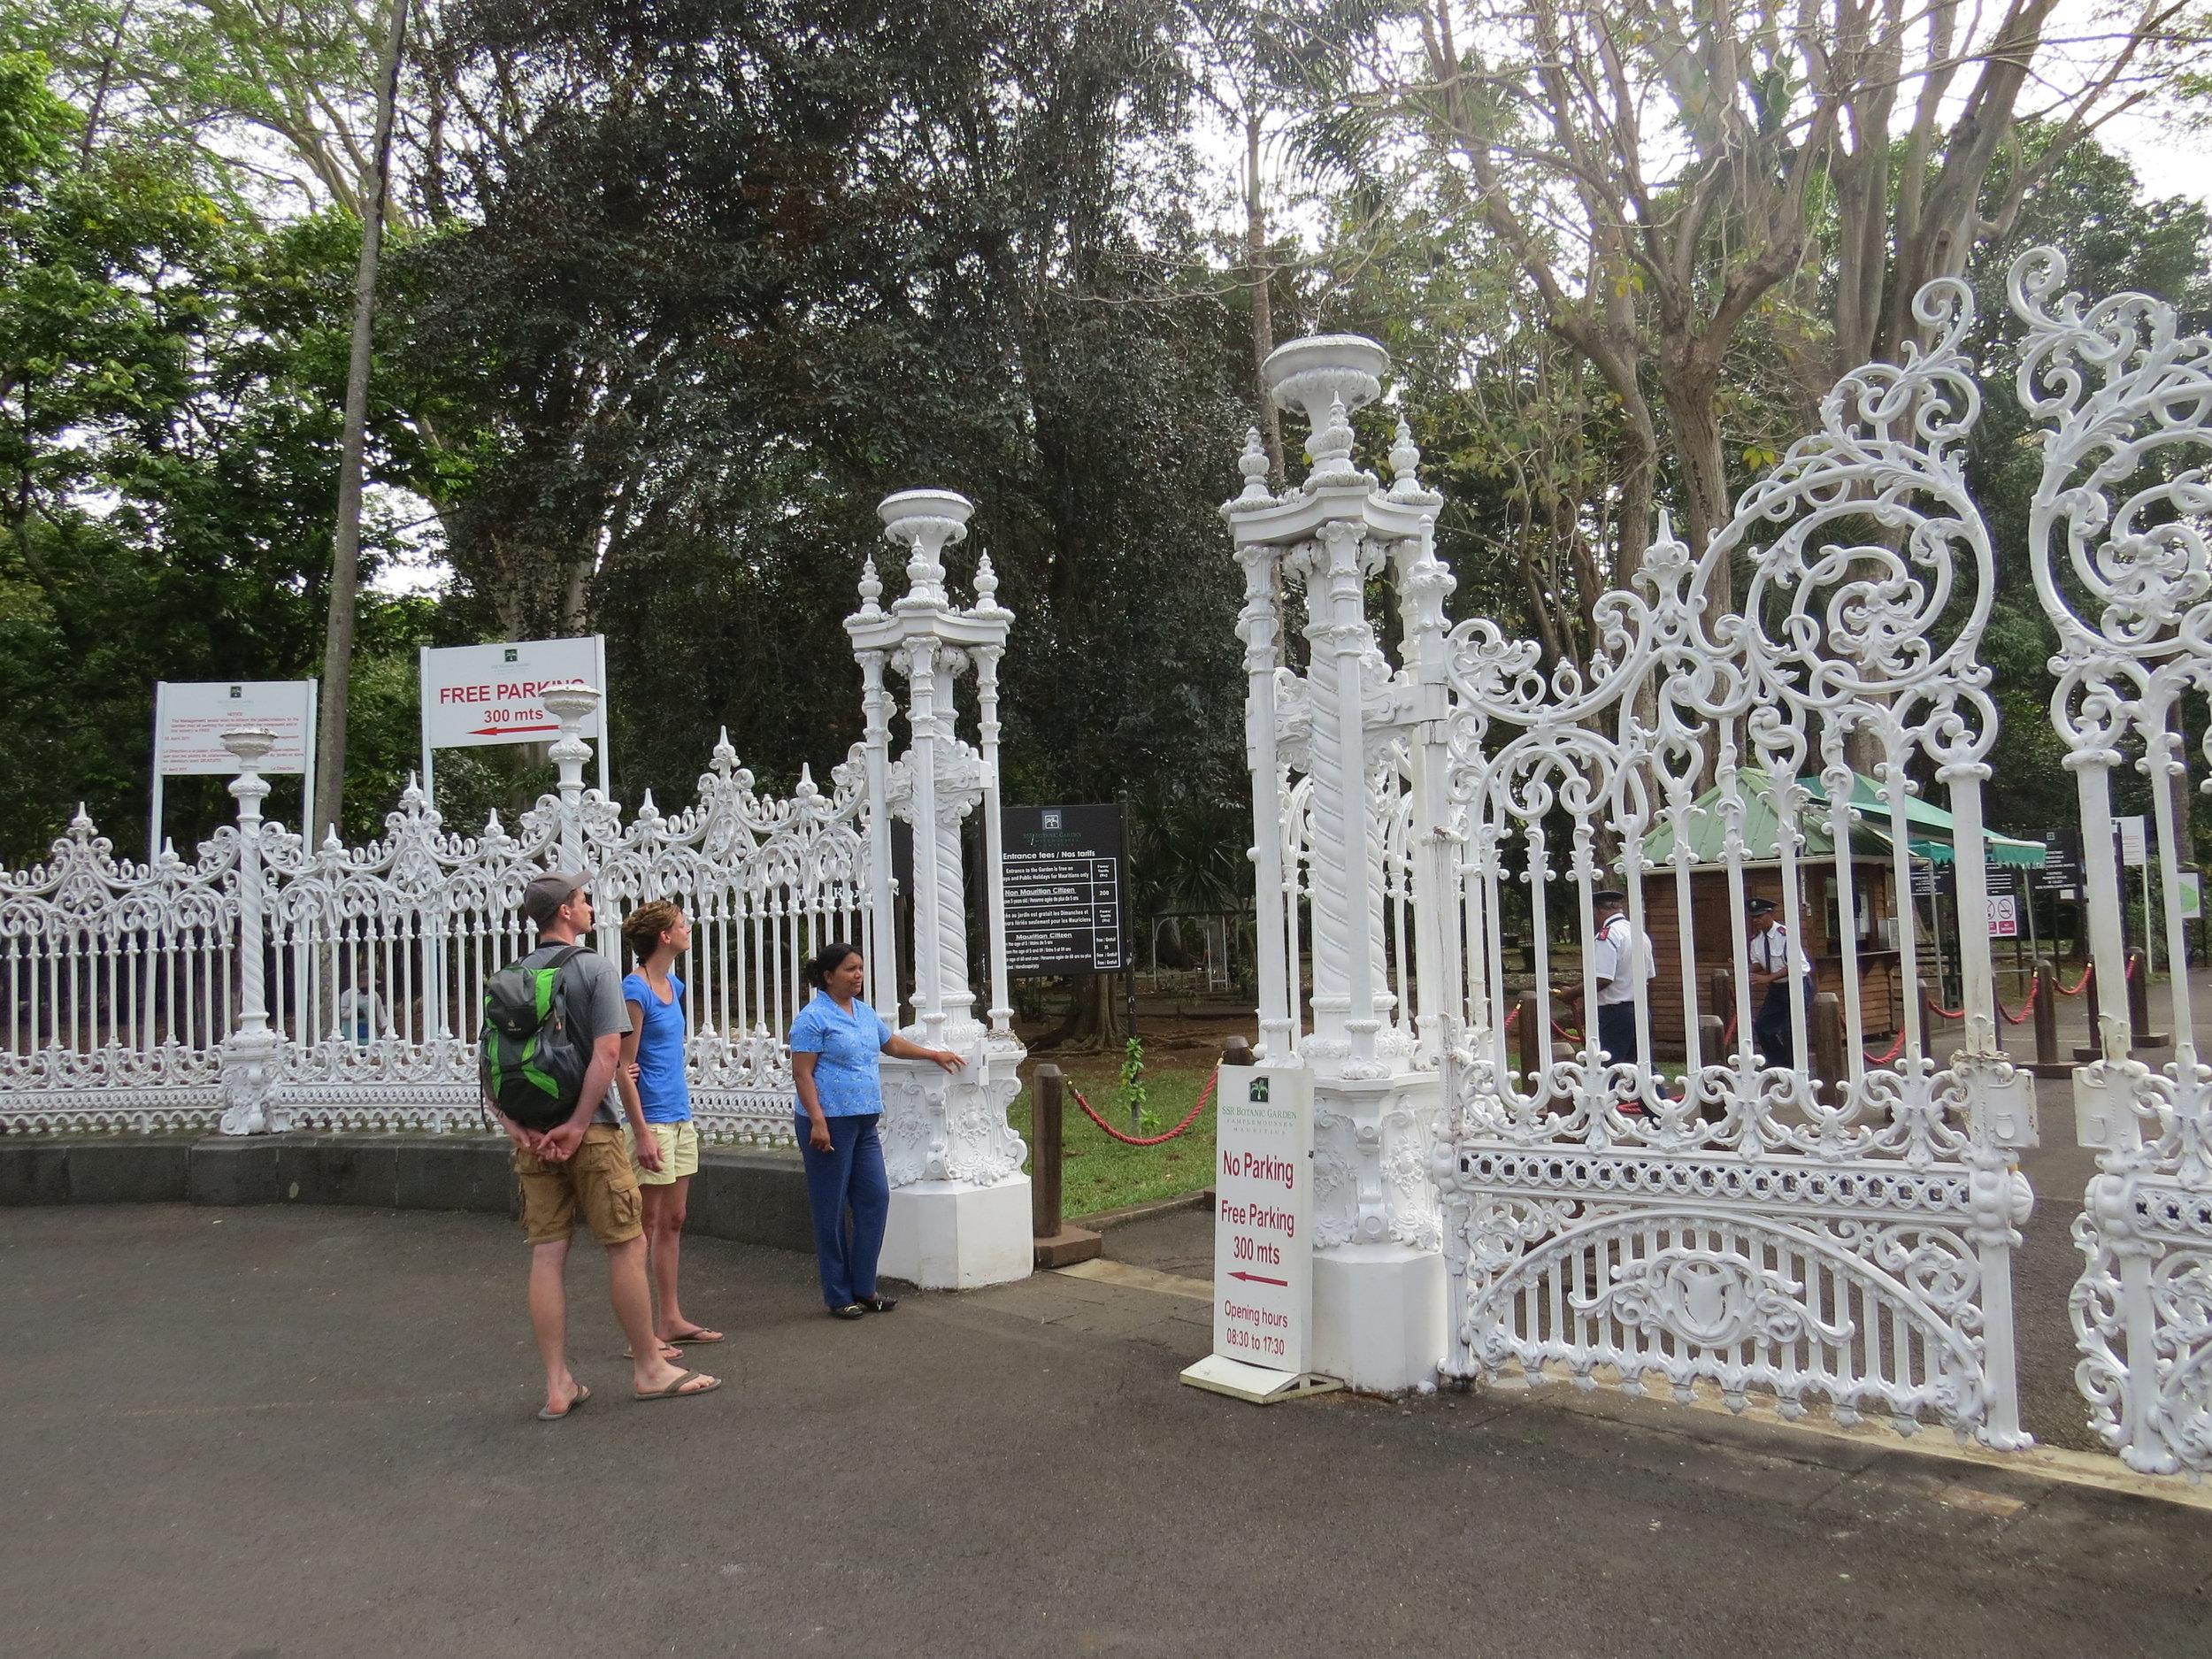 Ornate entrance gate to the Botanic Gardens